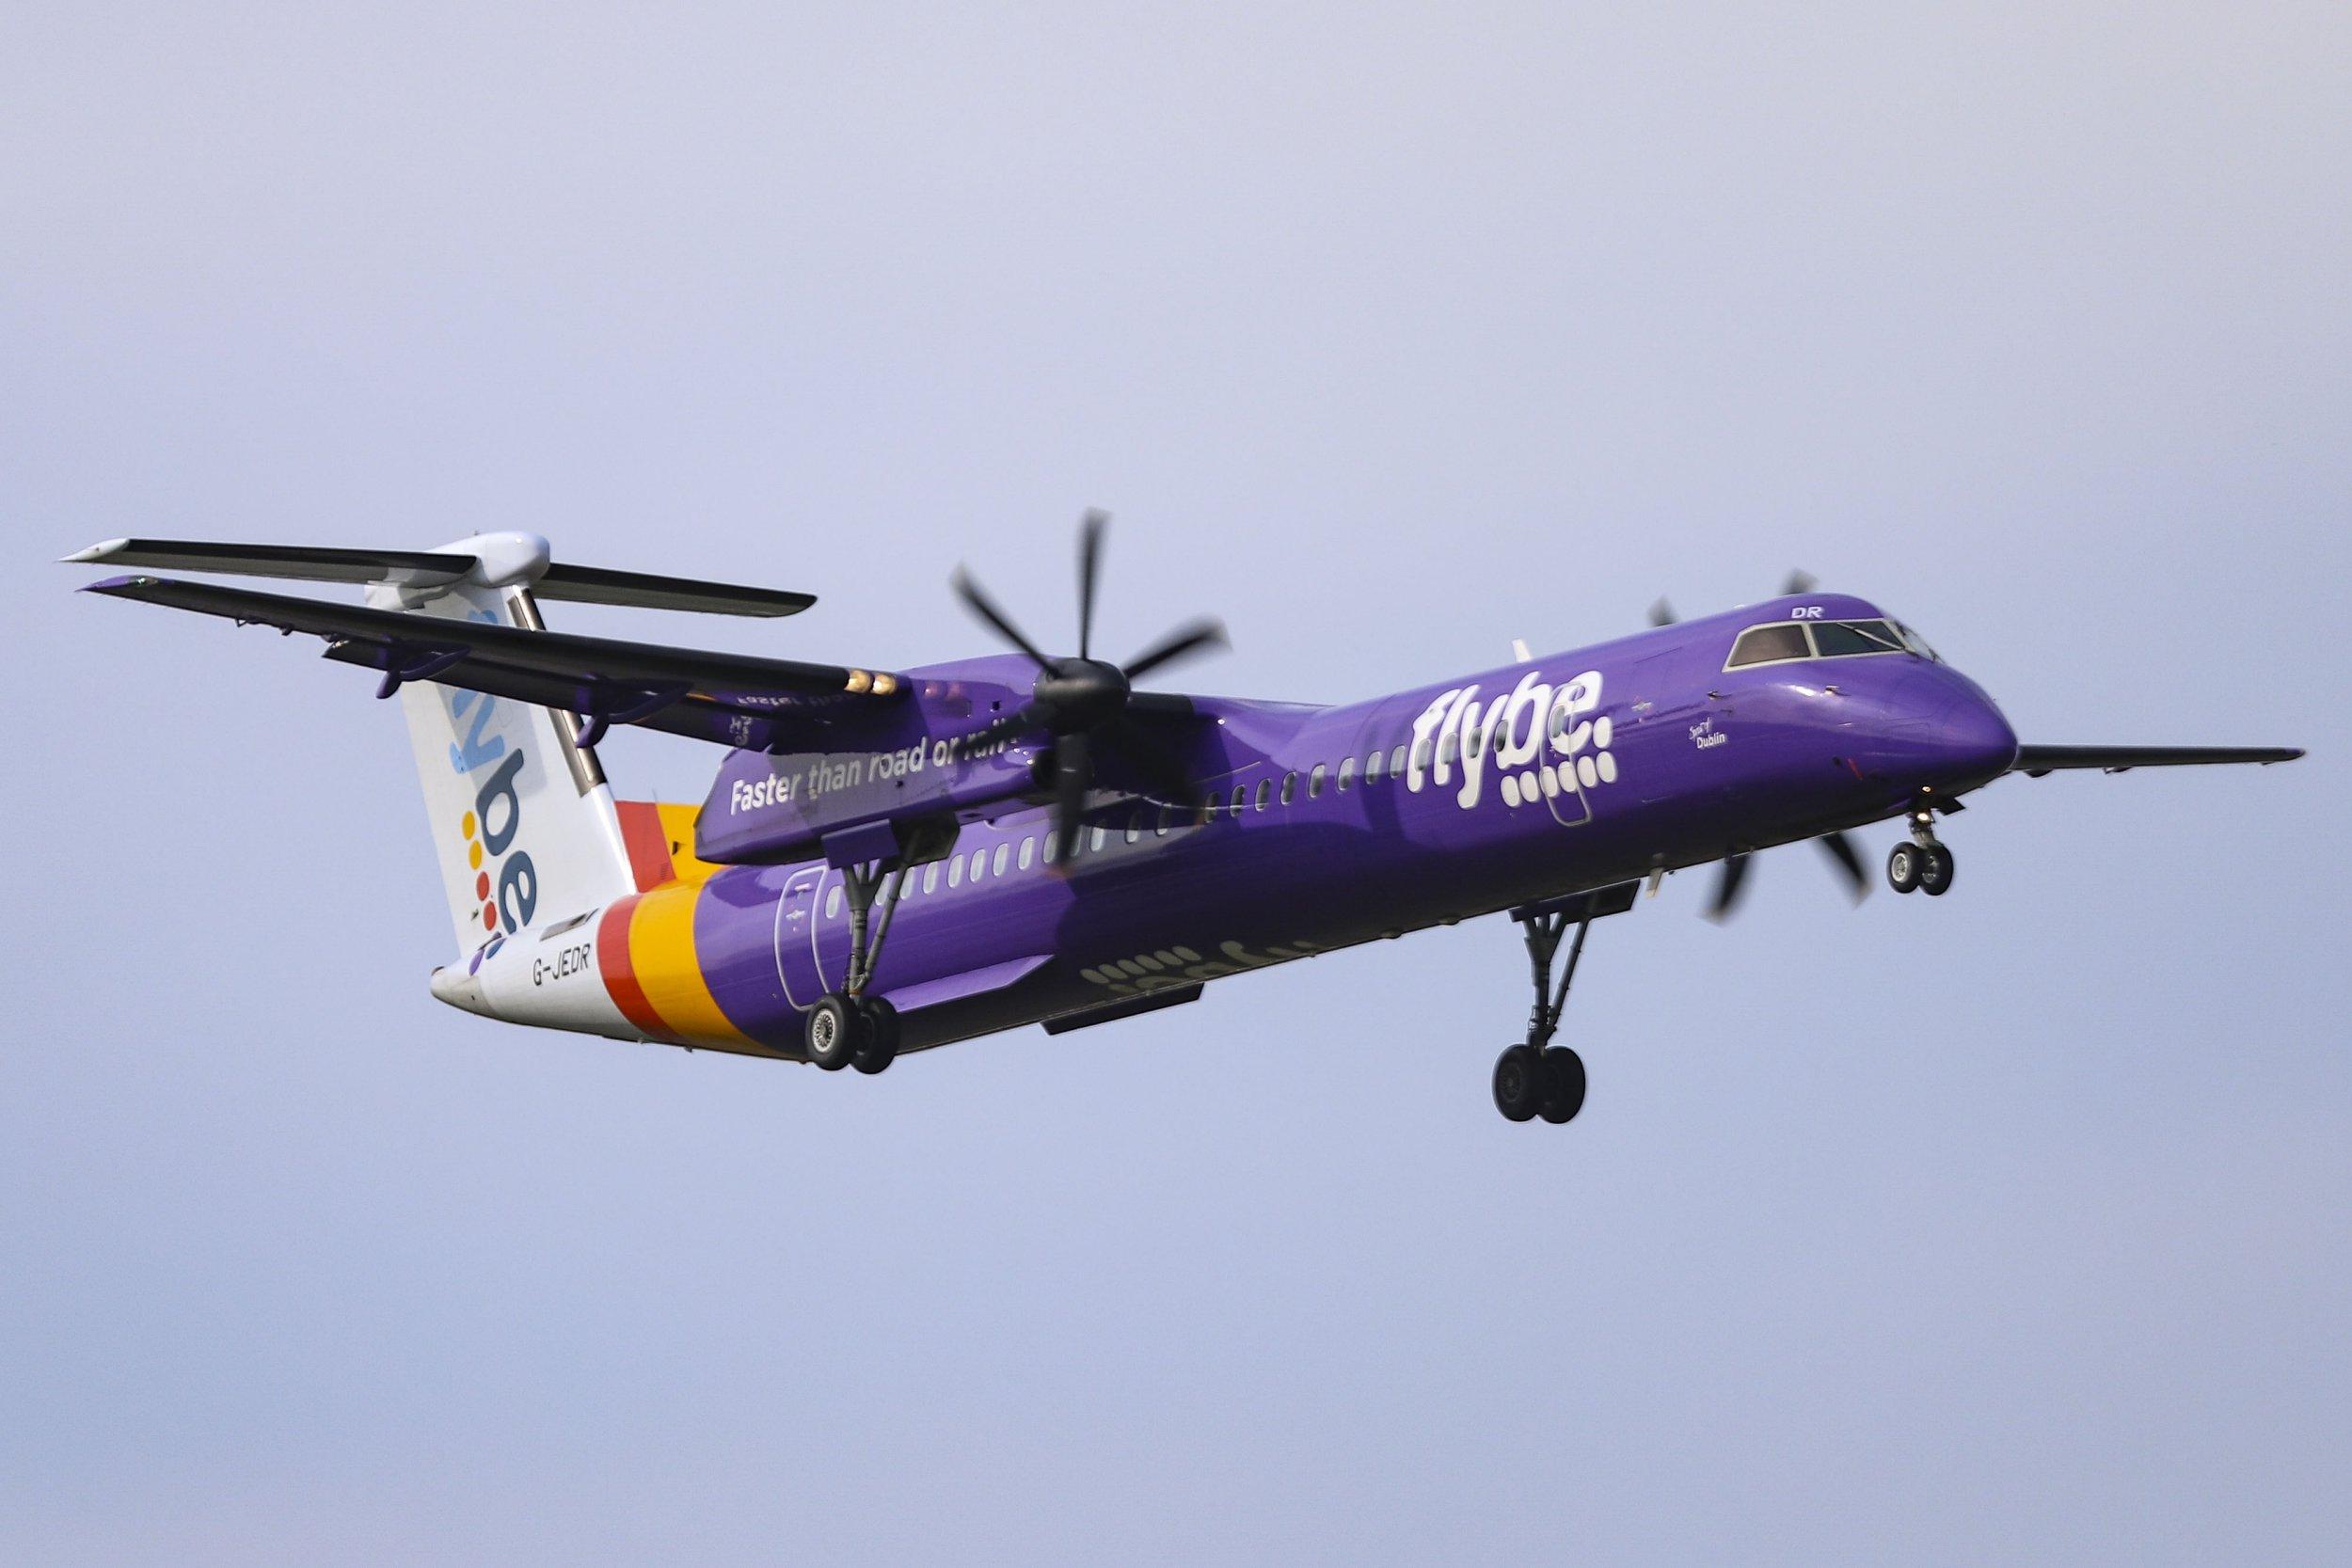 Flybe cancels dozens of flights after 'pilot shortage'